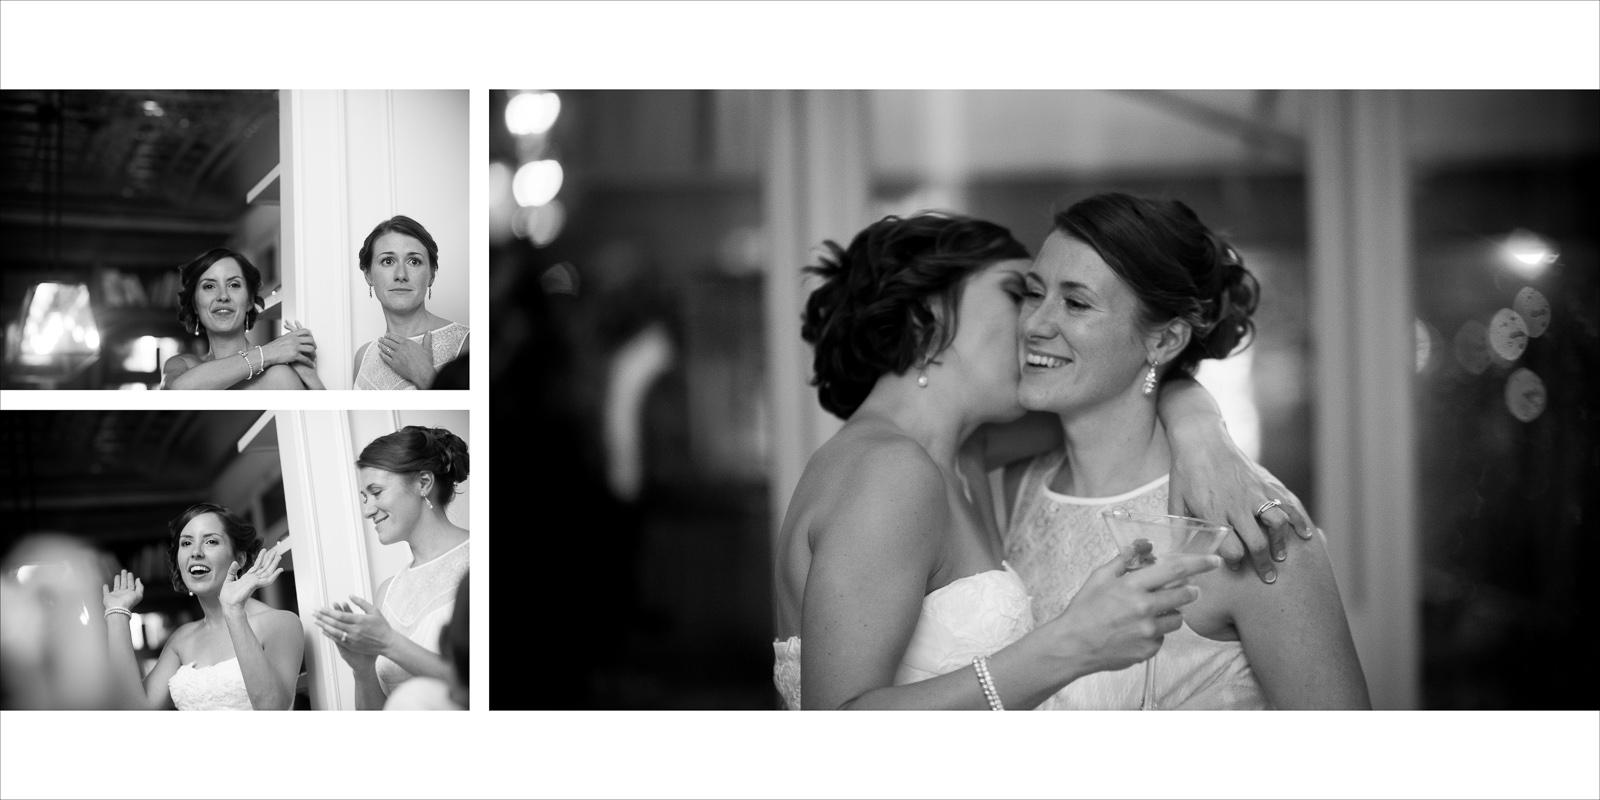 collingwood-wedding-photo-album-020.jpg